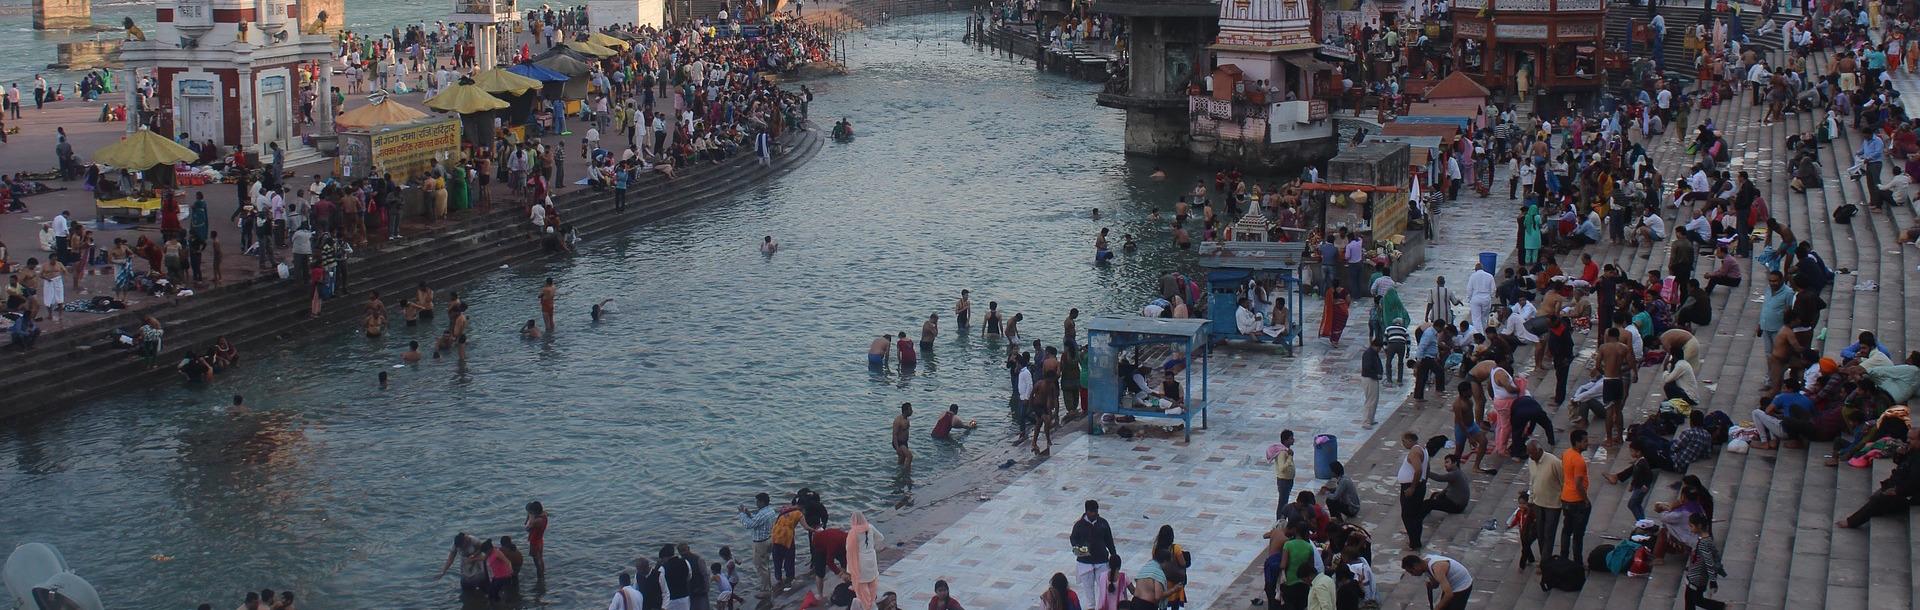 The Ganga flows through Haridwar, Uttarakhand. Credit: Jeevan/pixabay